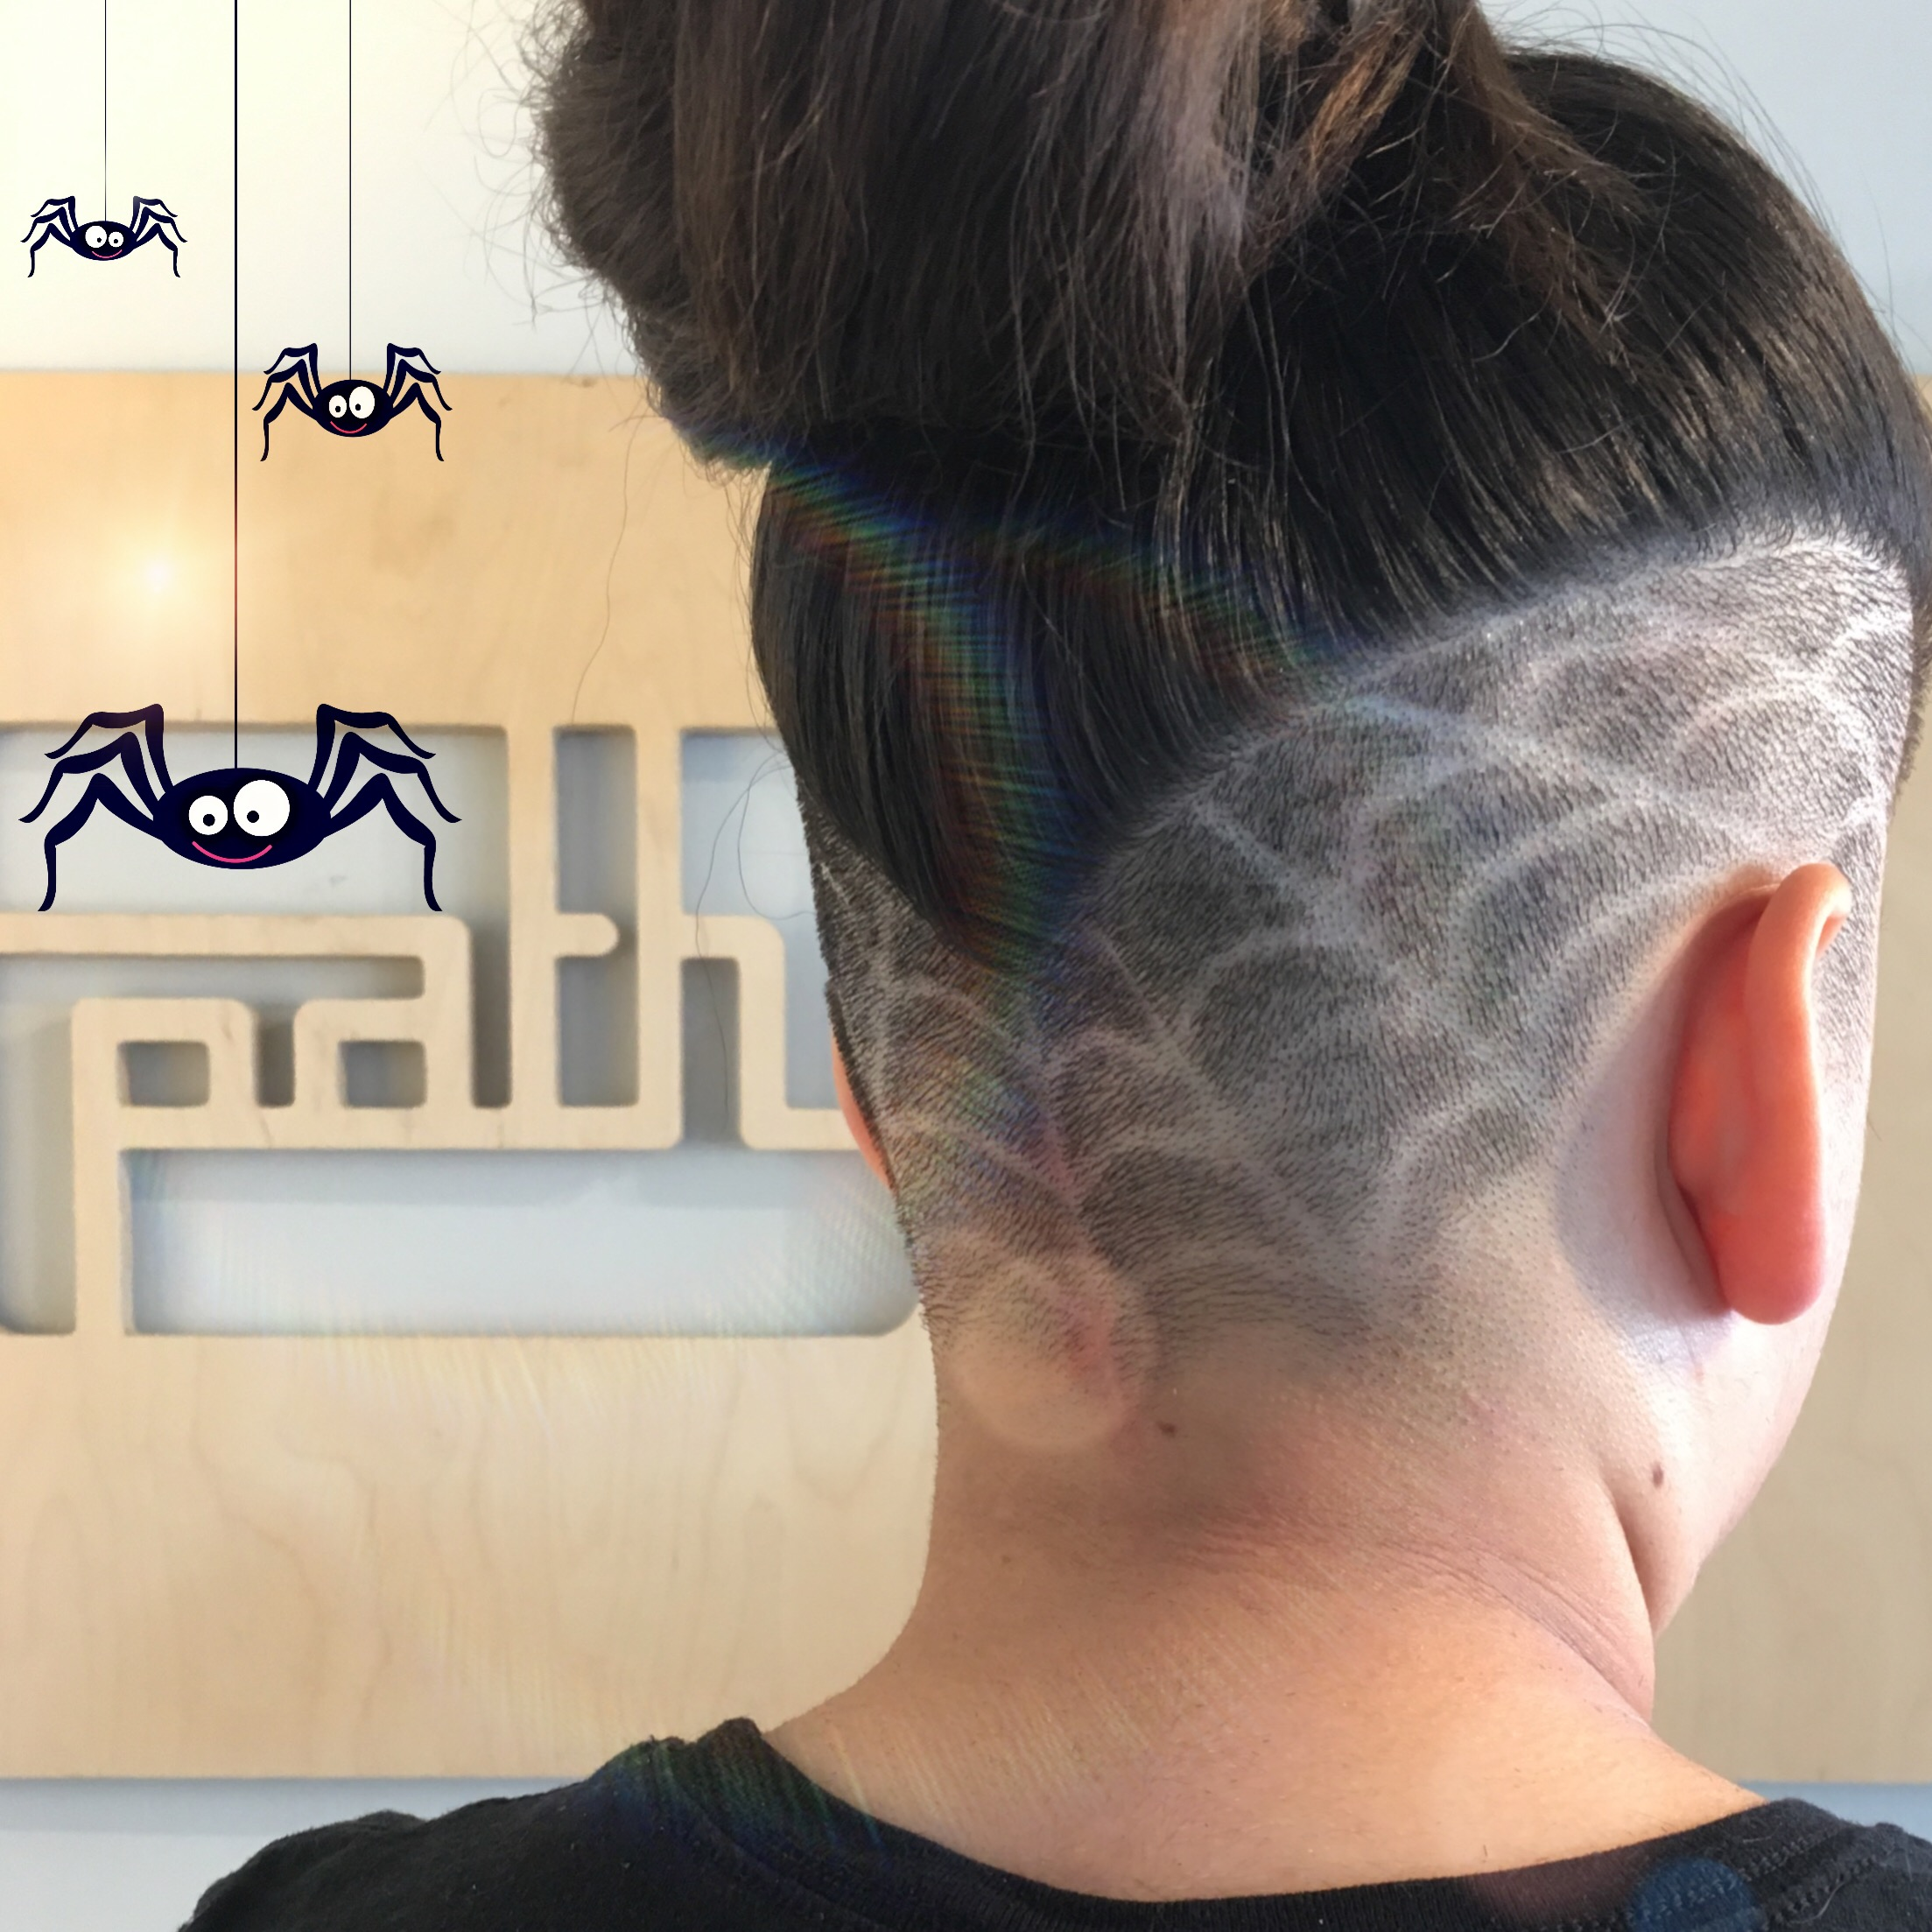 Astounding Freetoedit Spiderweb Shavedneck Neckshave Haircut Austi Natural Hairstyles Runnerswayorg